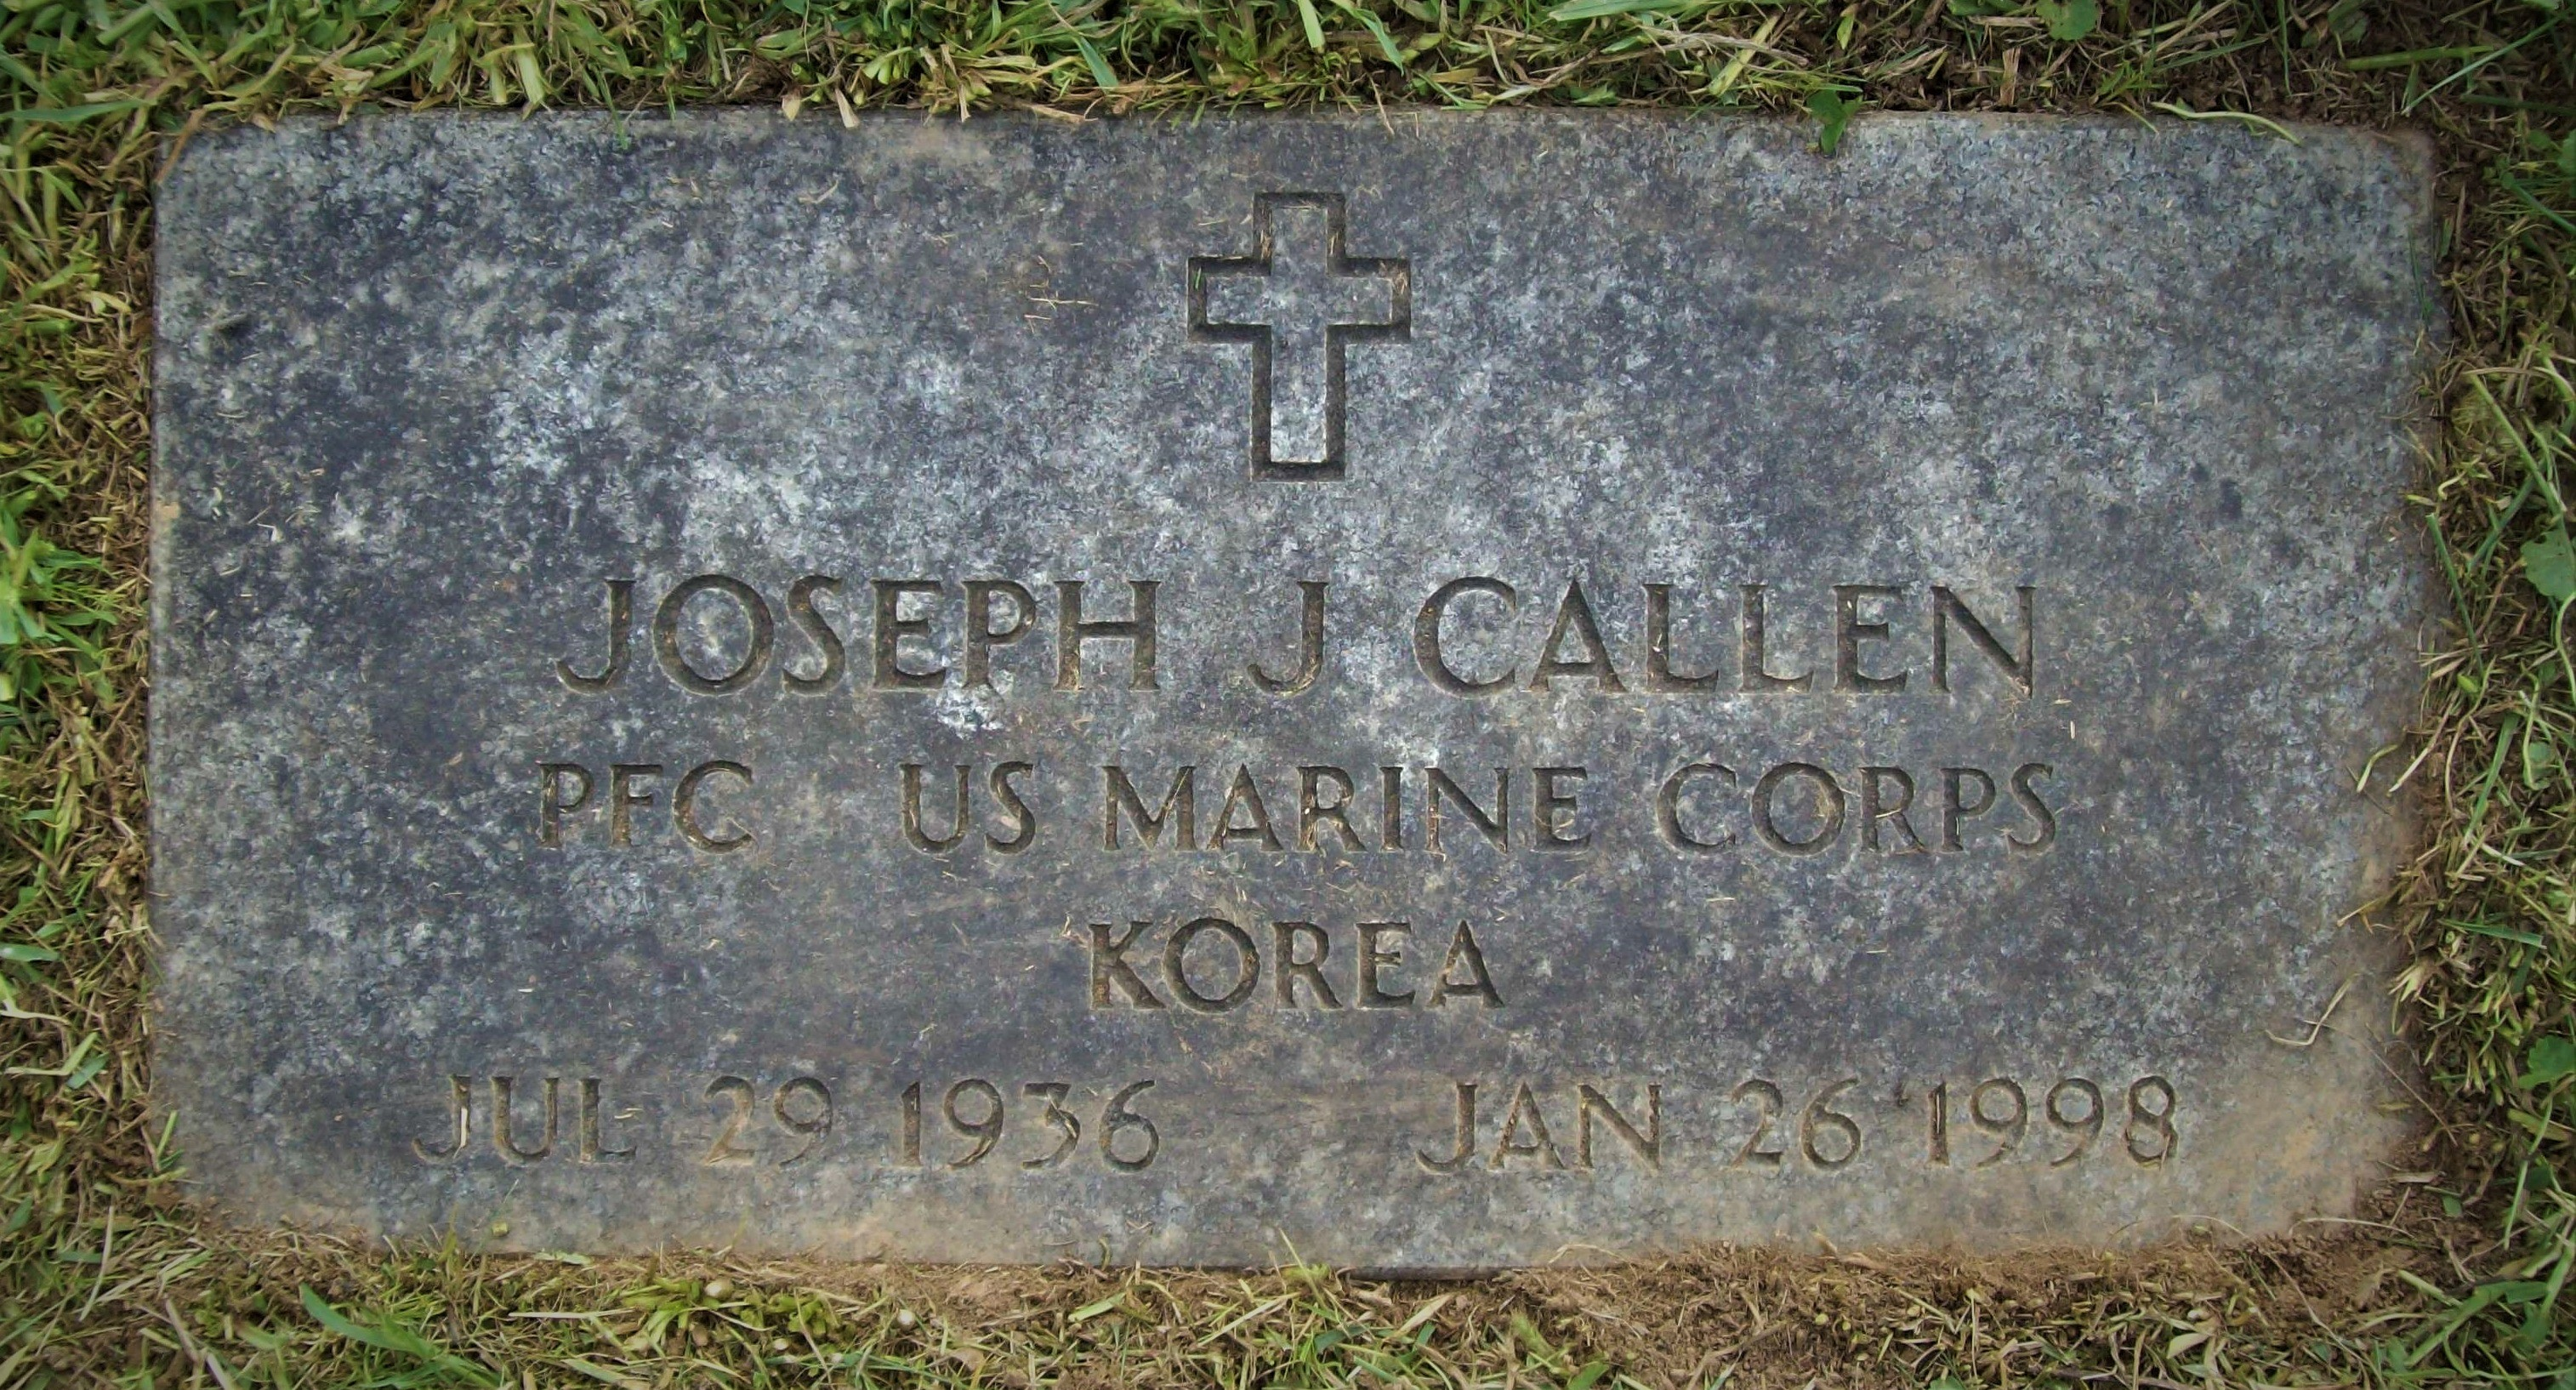 Joseph James Callen